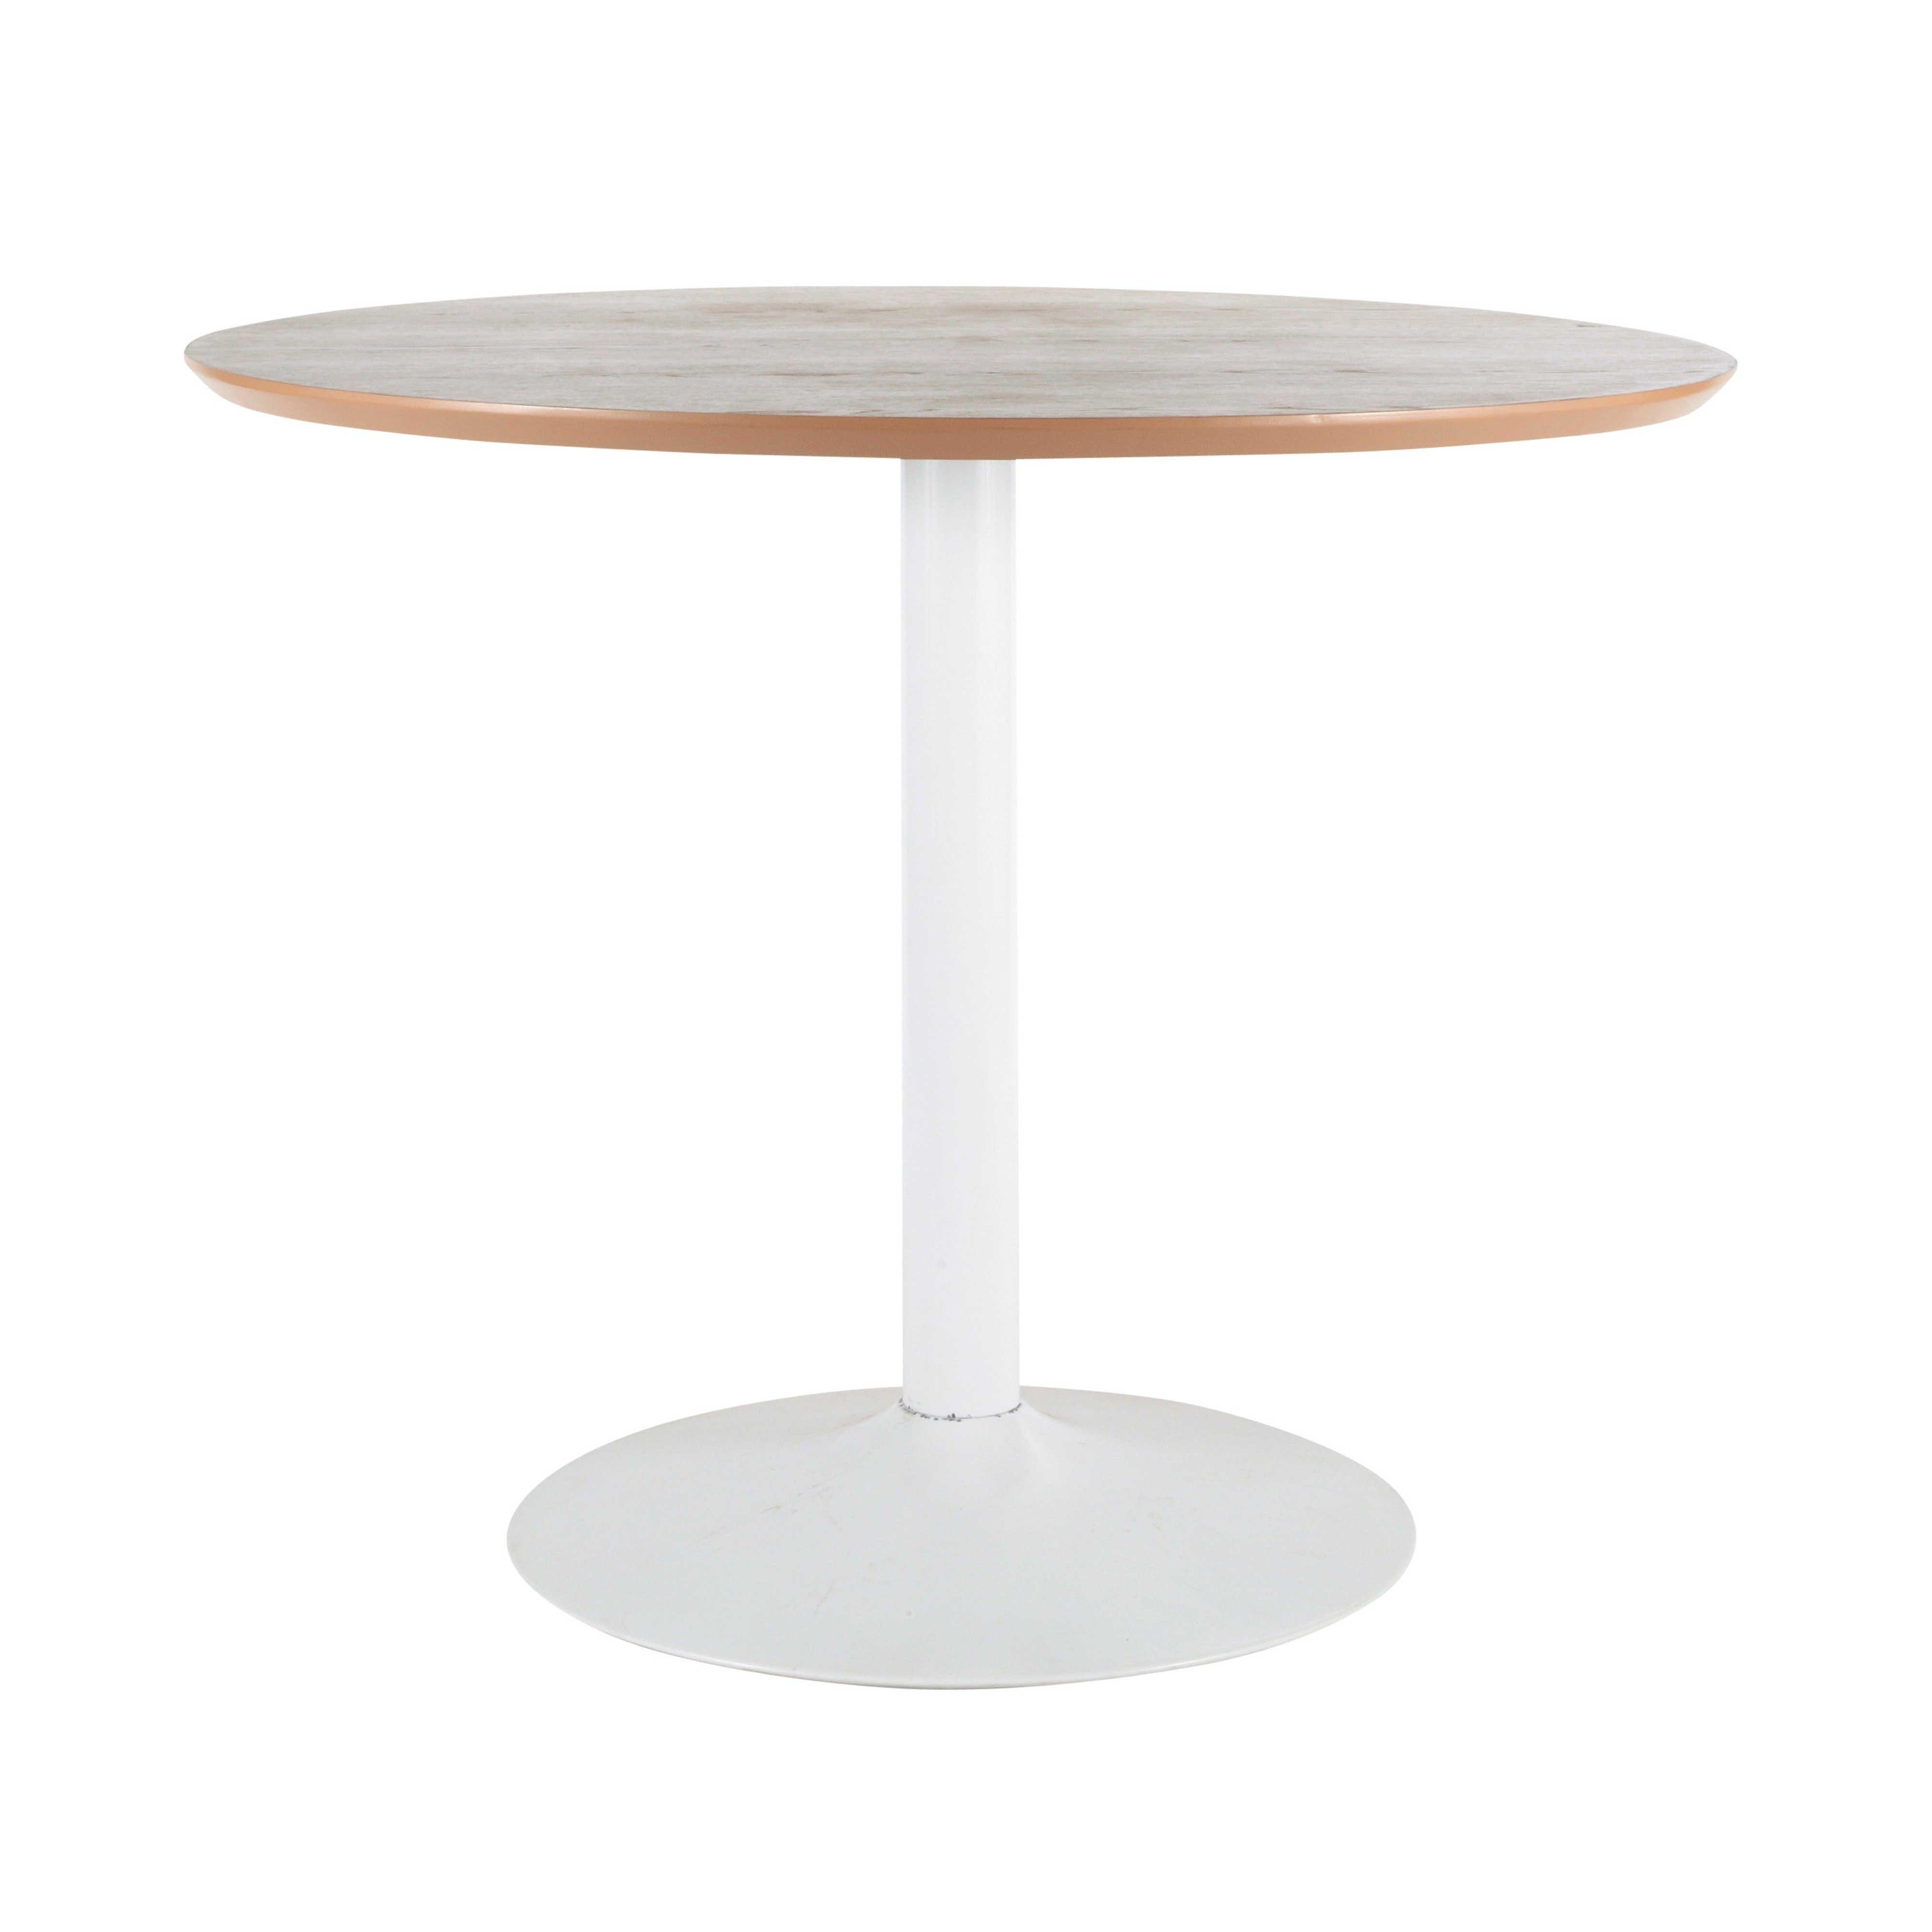 Tables Desks 家具デザイン 家具 デザイン